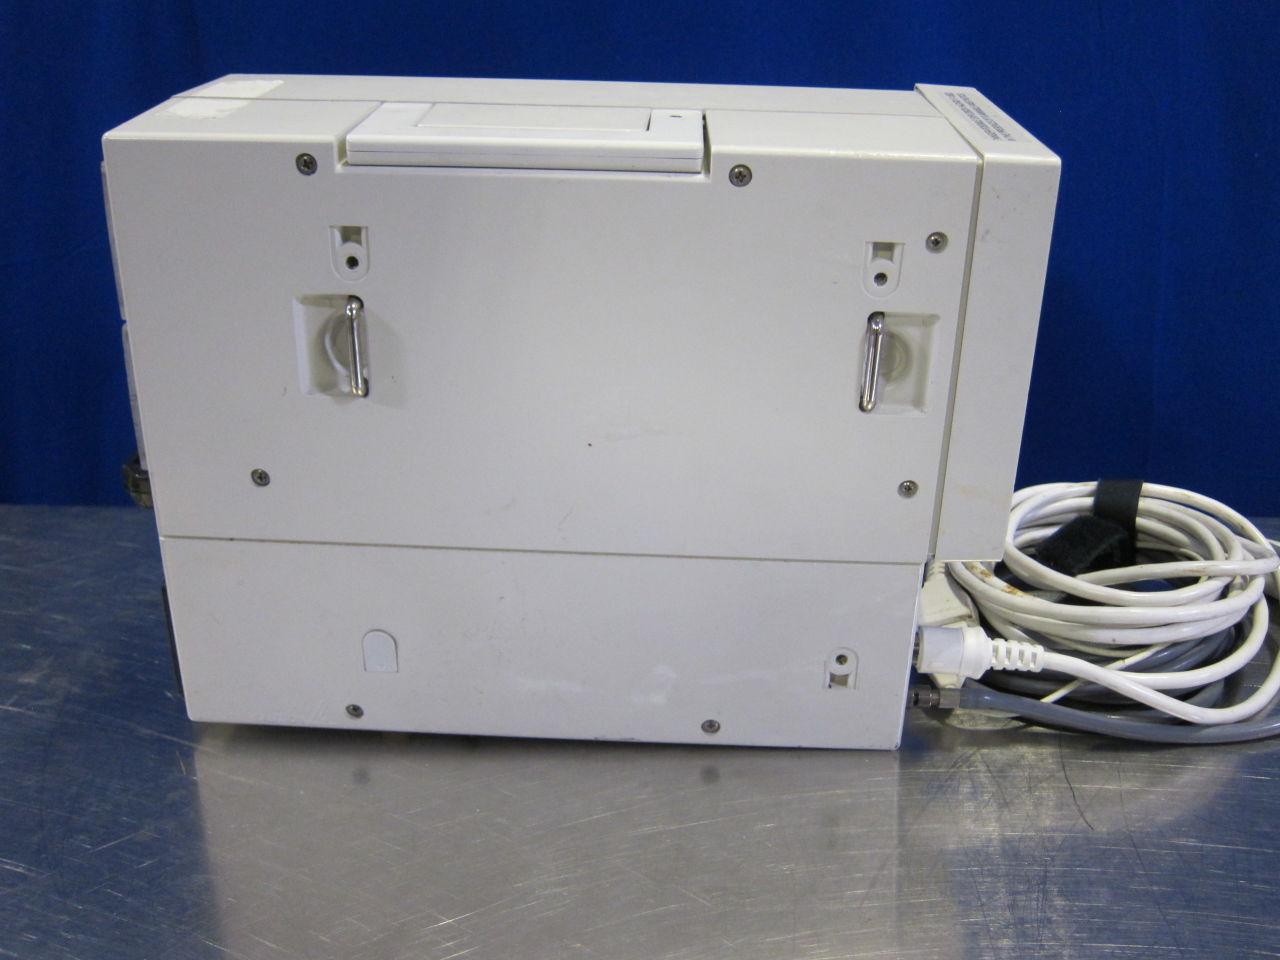 DATASCOPE Accutorr 4 Series Monitor